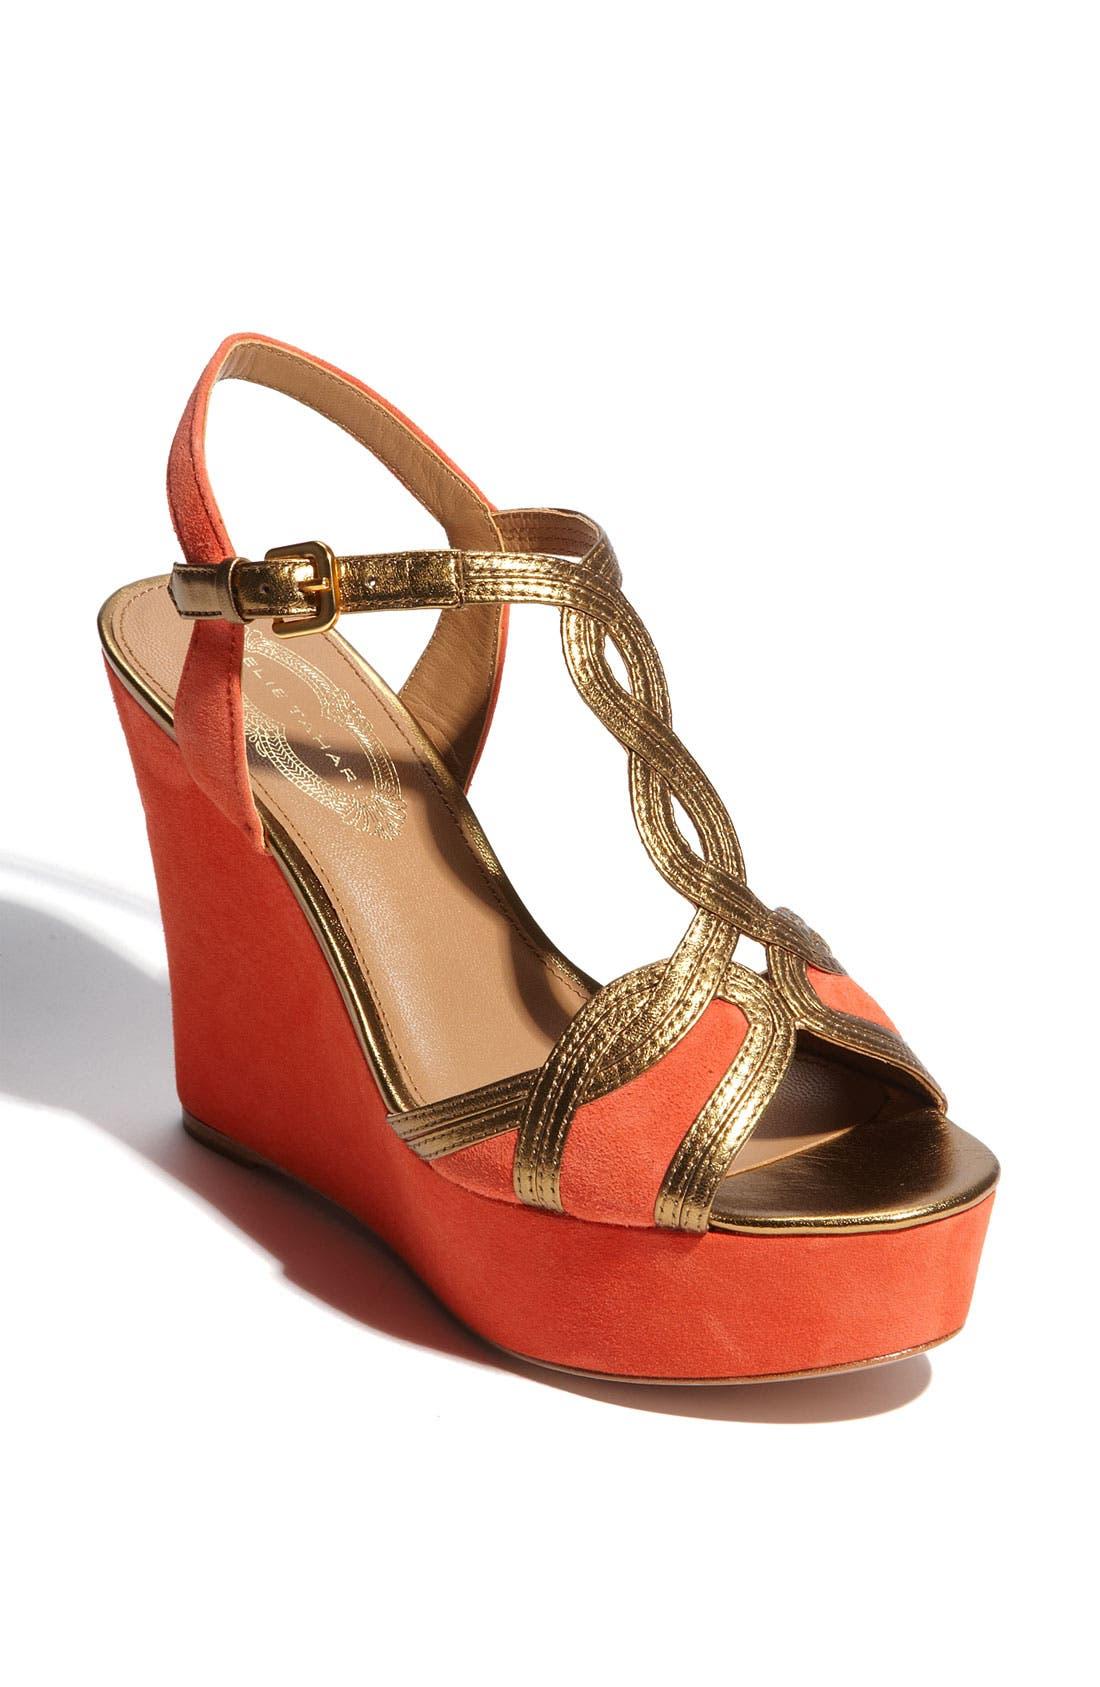 Alternate Image 1 Selected - Elie Tahari 'Lynette' Wedge Sandal